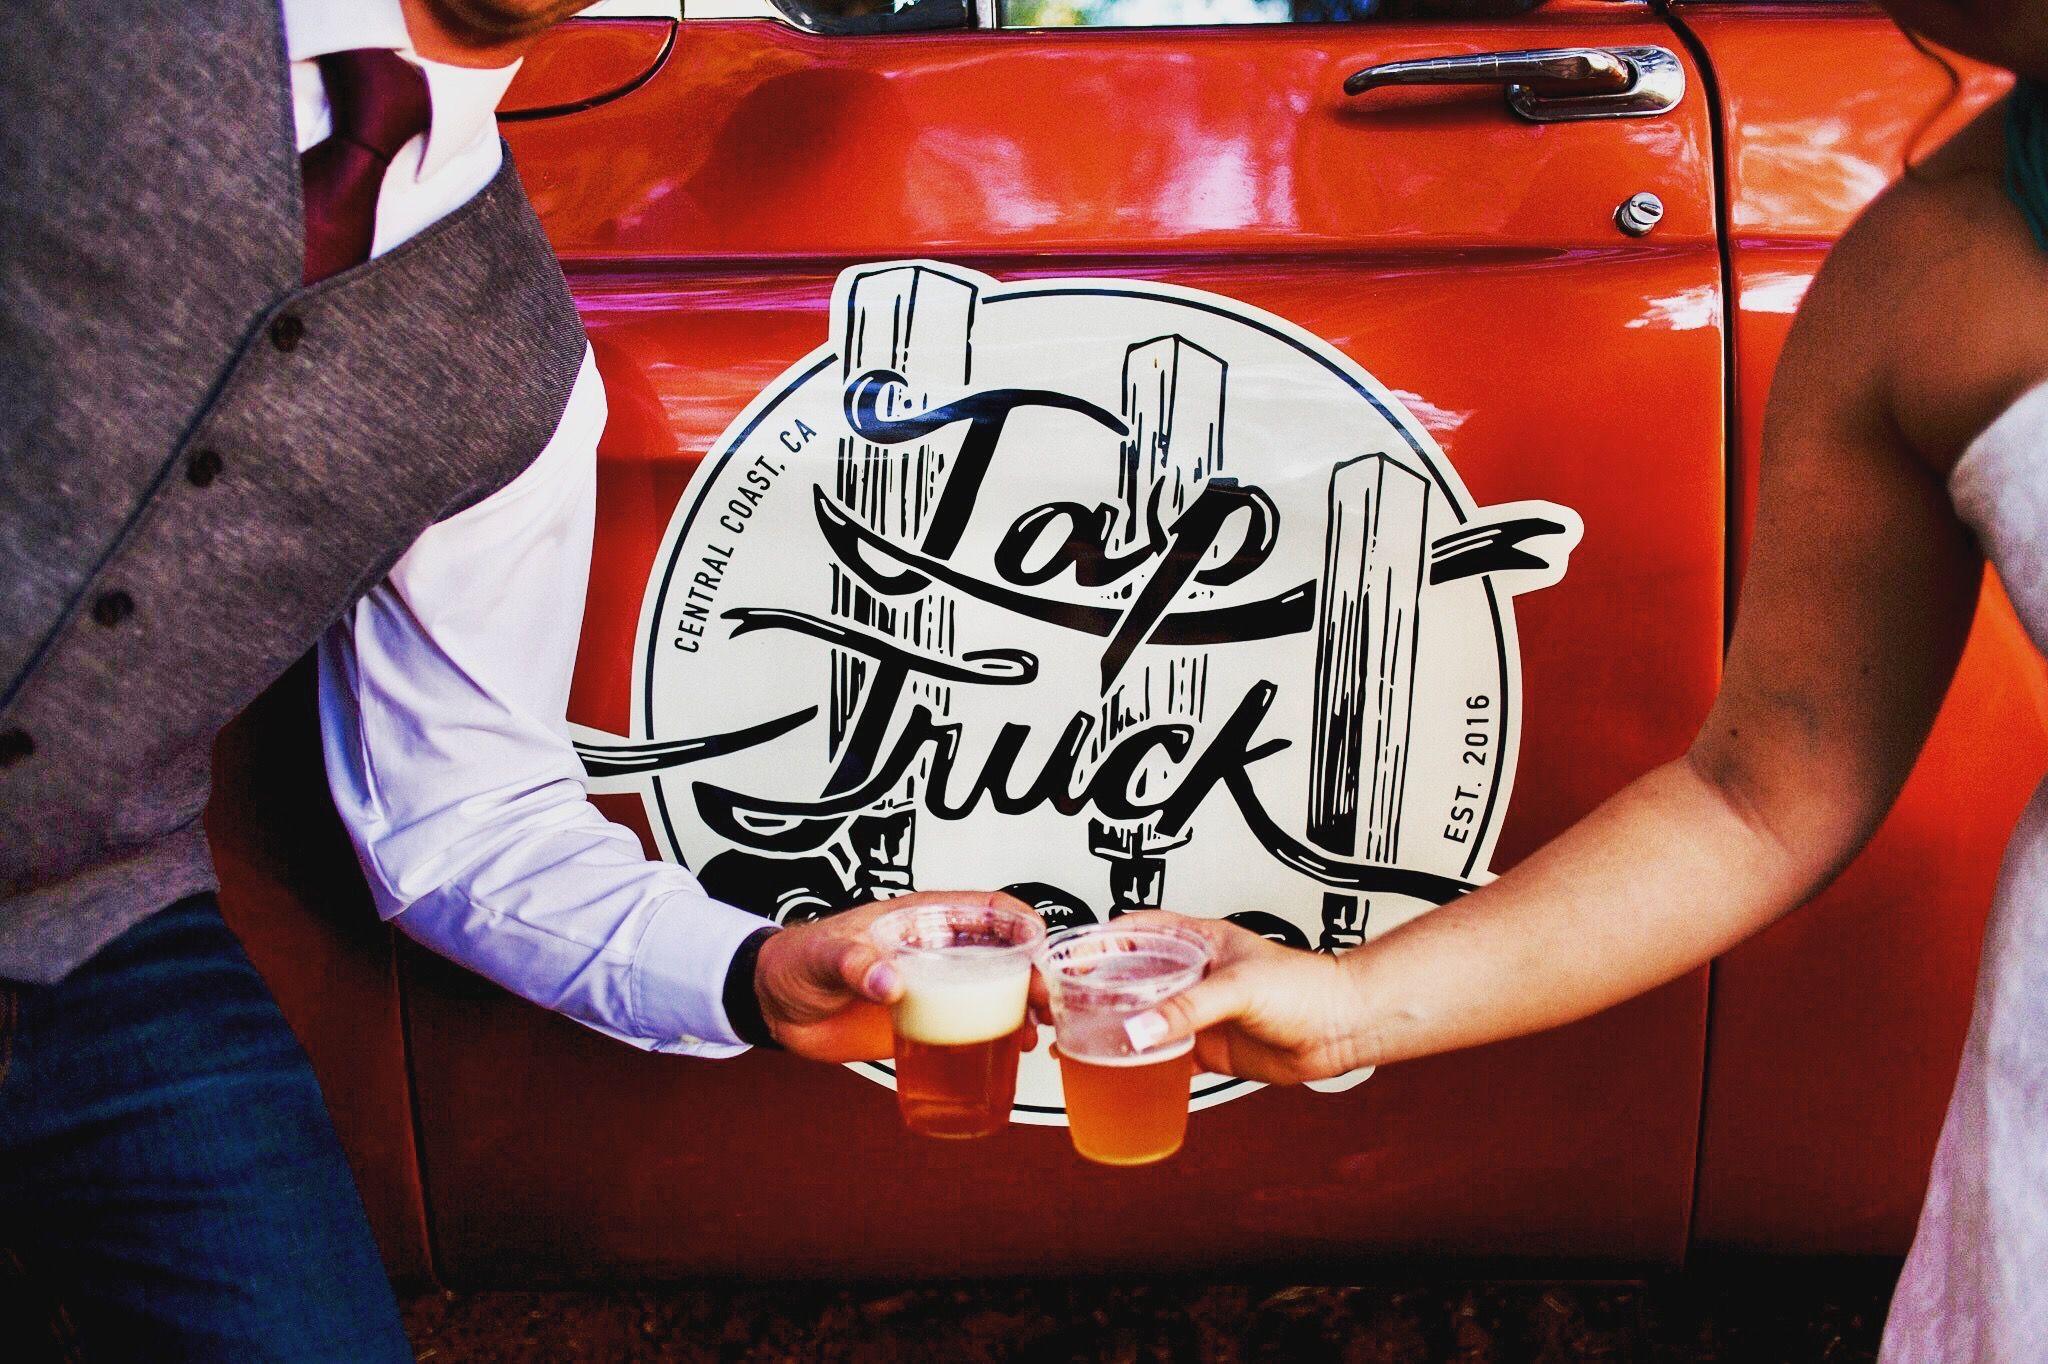 Beer Truck Tap Truck Wine Truck Mobile Bar Wedding Rental Craft Beer Classic Cars Bar On Wheels Mobile Cocktails Beer Truck Vintage Beer Bar Catering